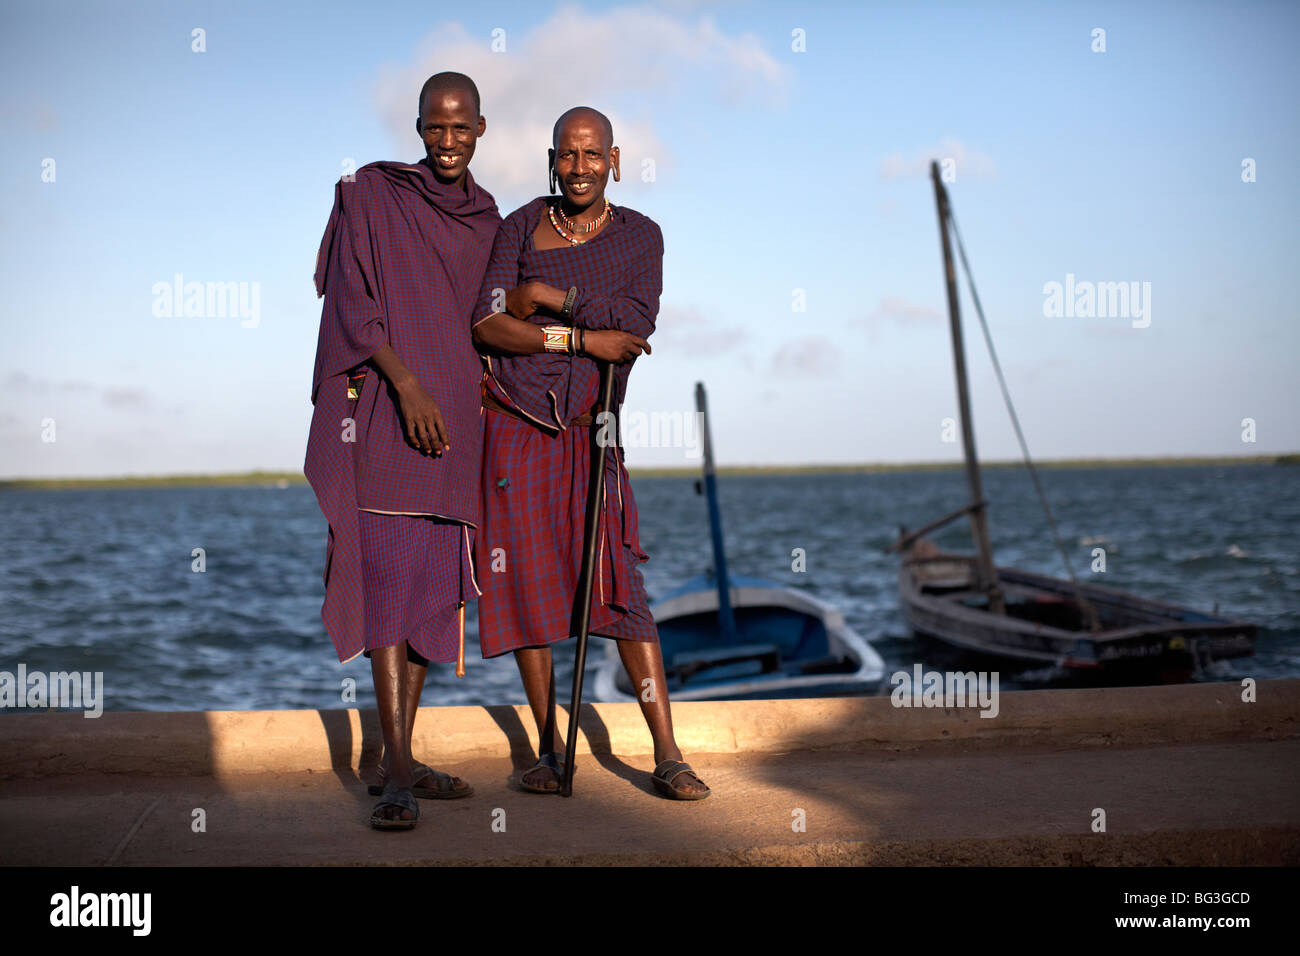 Maasai tribesmen on the island of Lamu, Kenya, East Africa, Africa Stock Photo